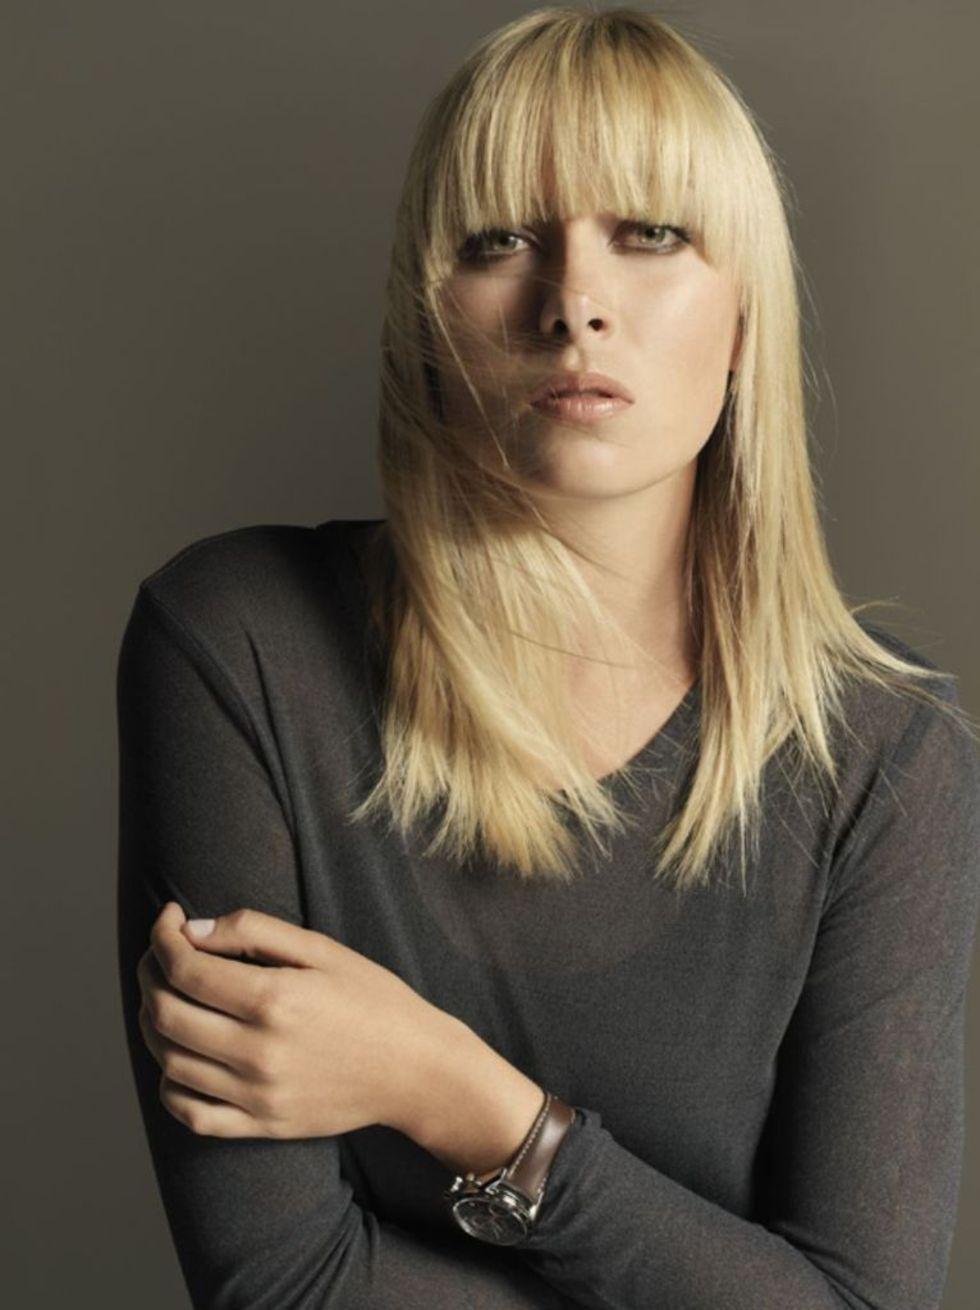 maria-sharapova-tag-geauer-ad-campaign-photoshoot-mq-01